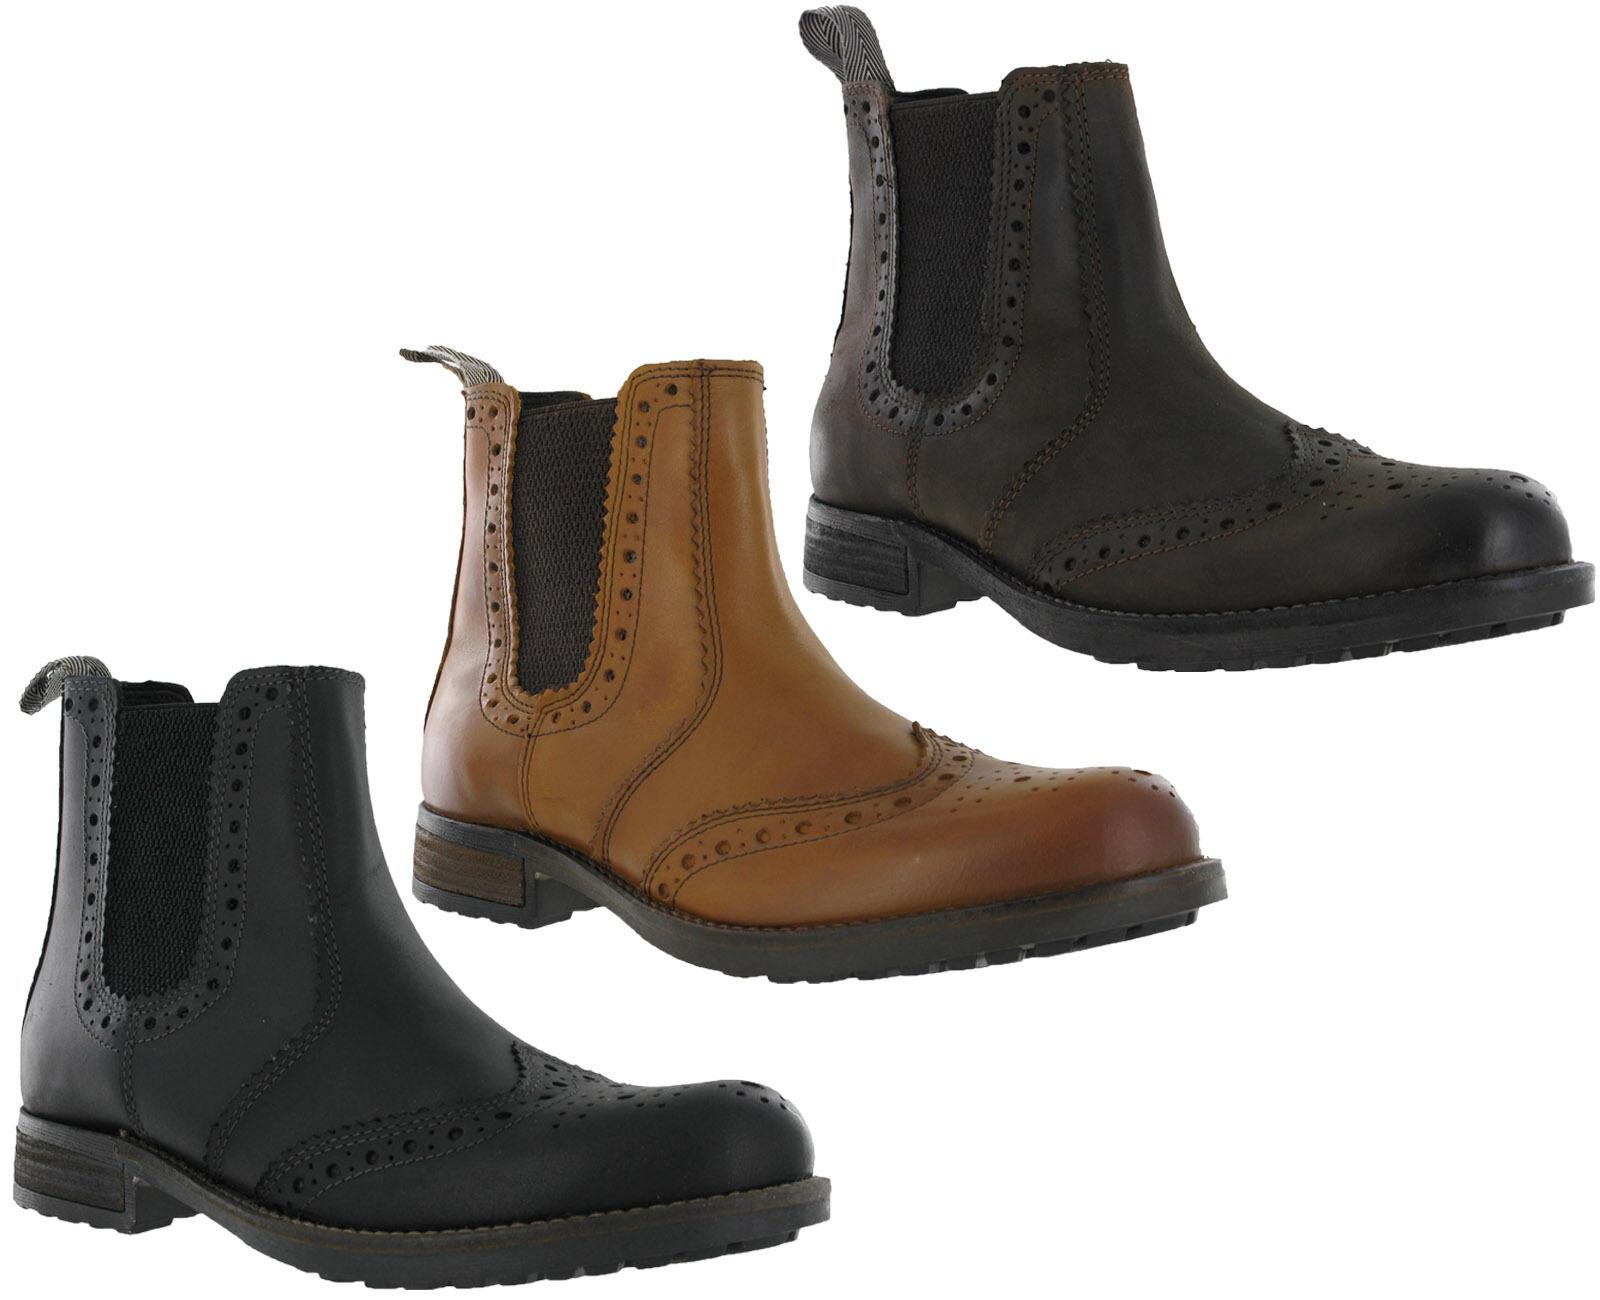 Roamers Dealer Brogues Gusset Caviglia in Pelle On da Uomo Cuscino Pull On Pelle Stivali 02d33b